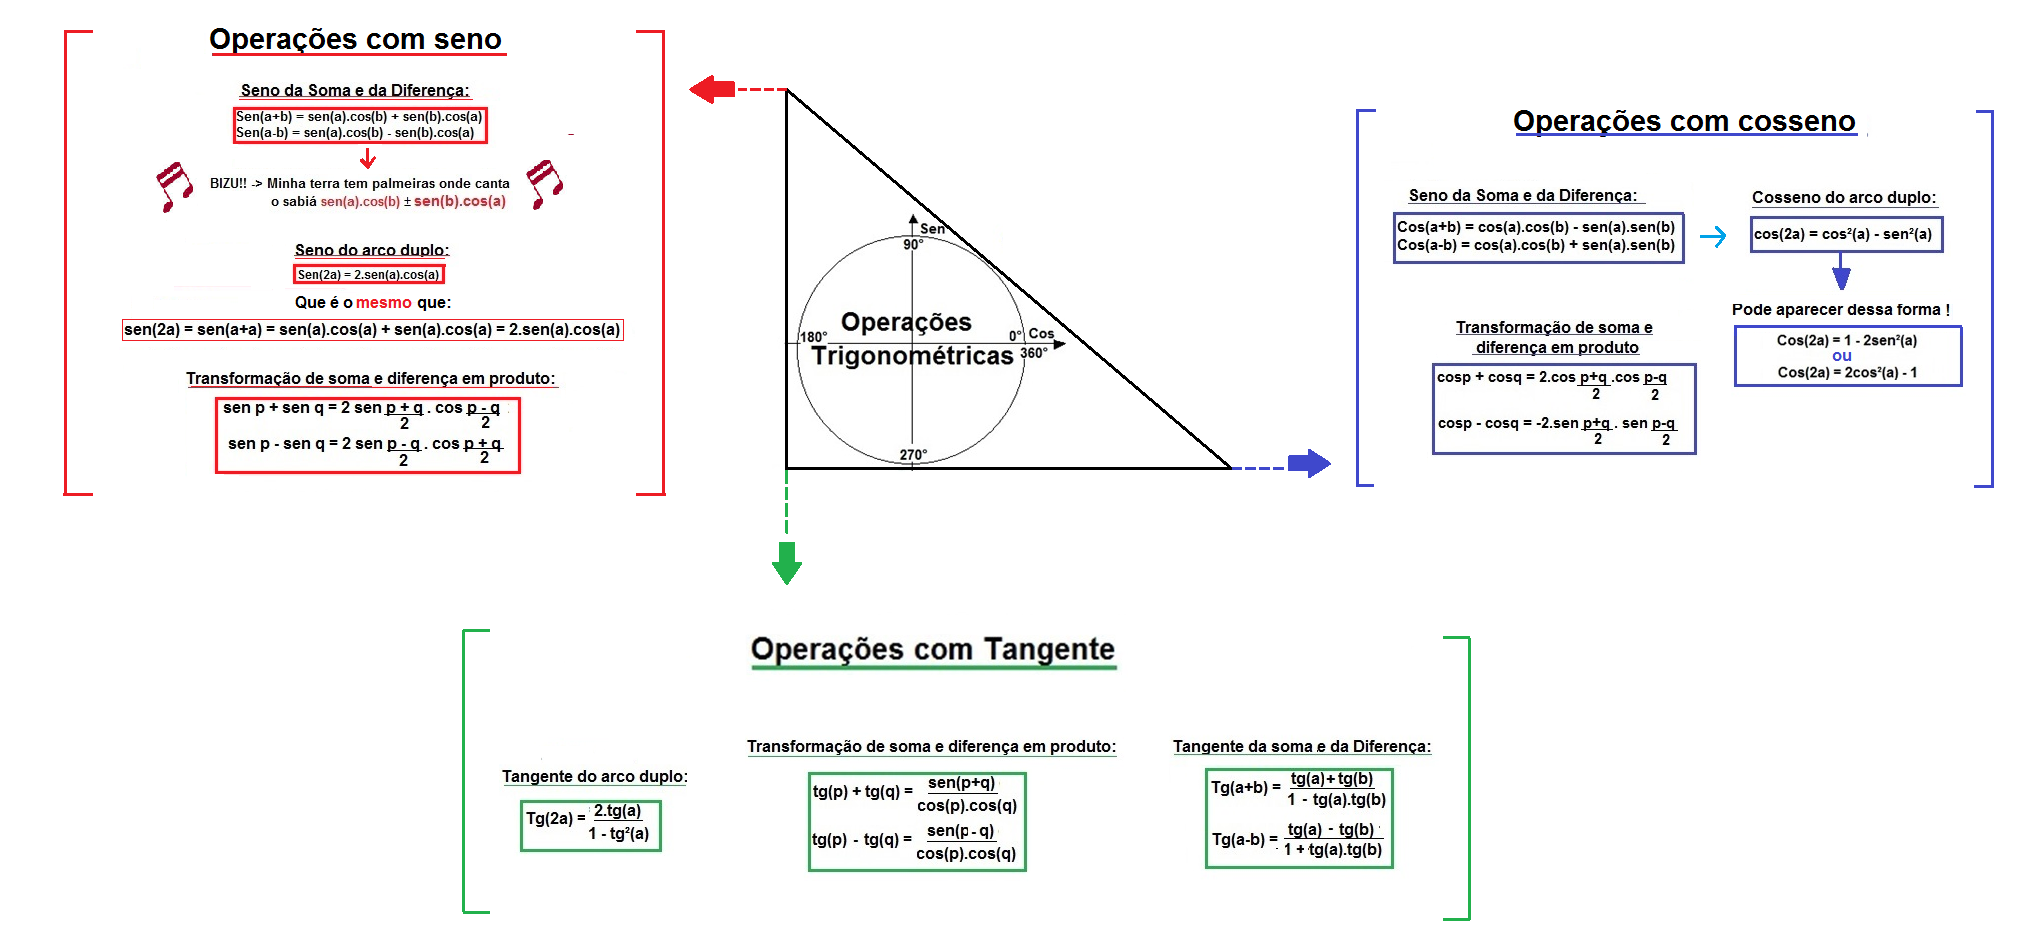 mapa-mat-operacoes-trigonometricas